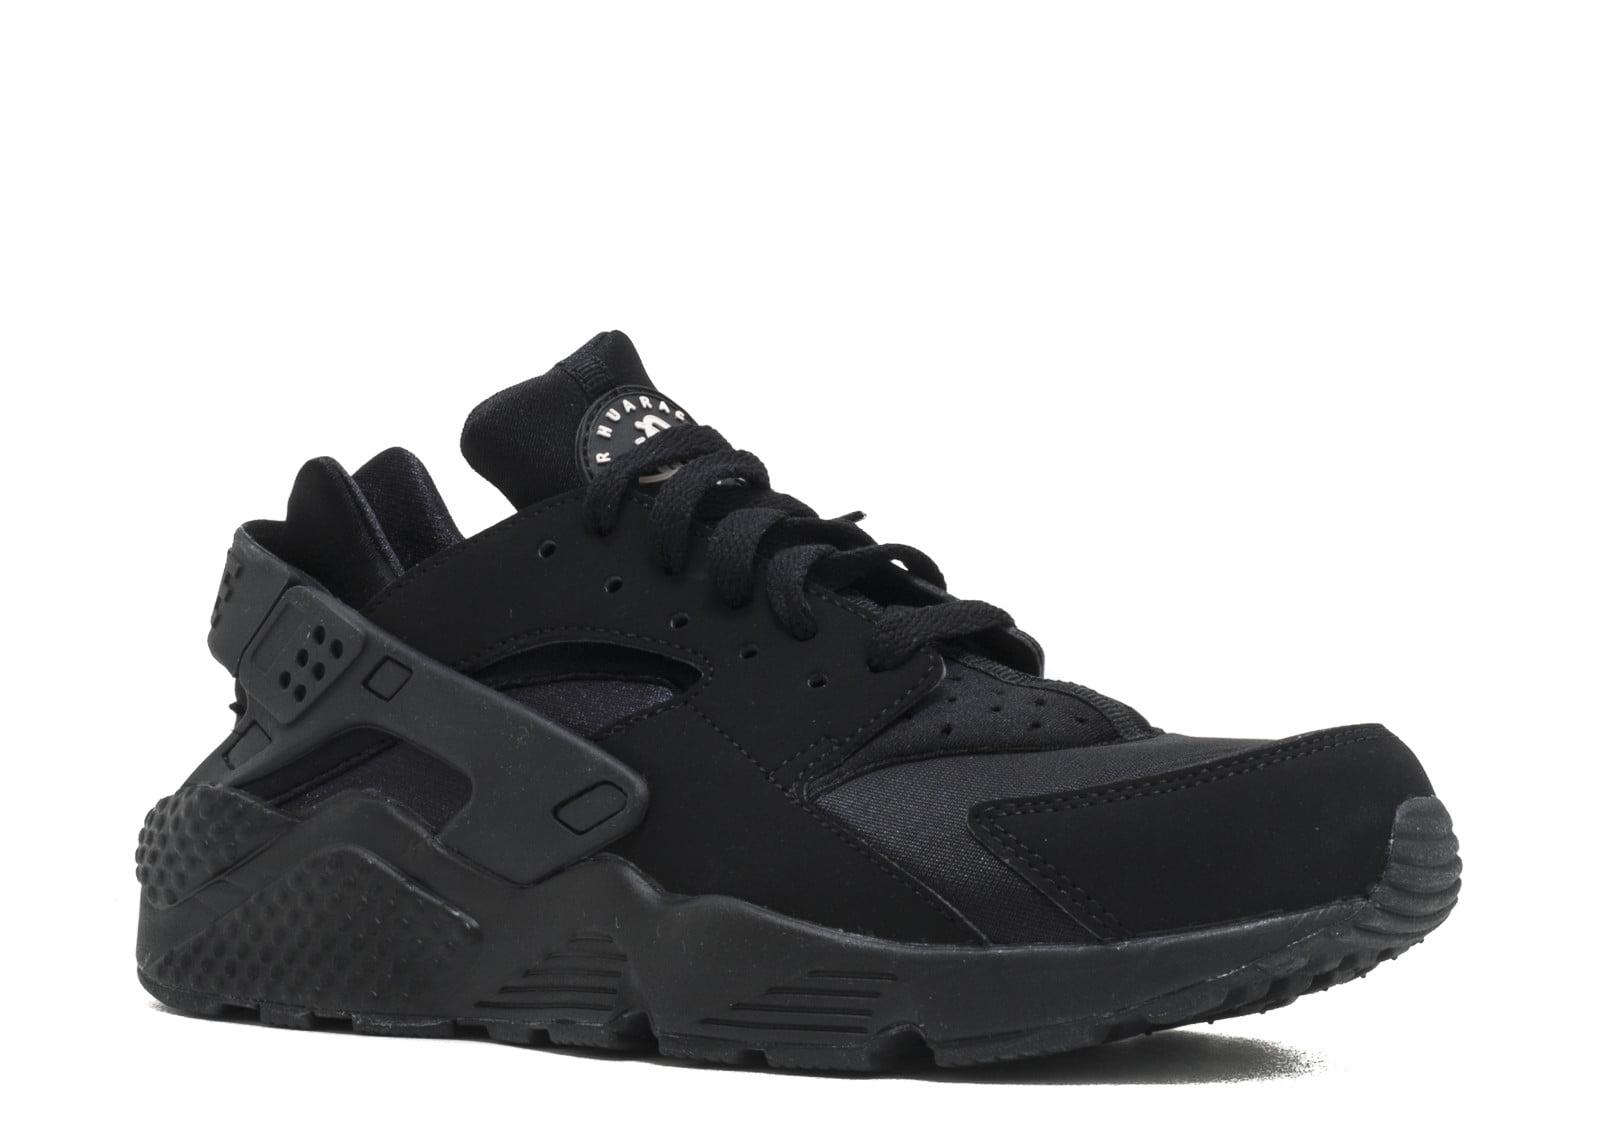 Nike Air Huarache Men's Shoes Black White 318429-003 by Nike